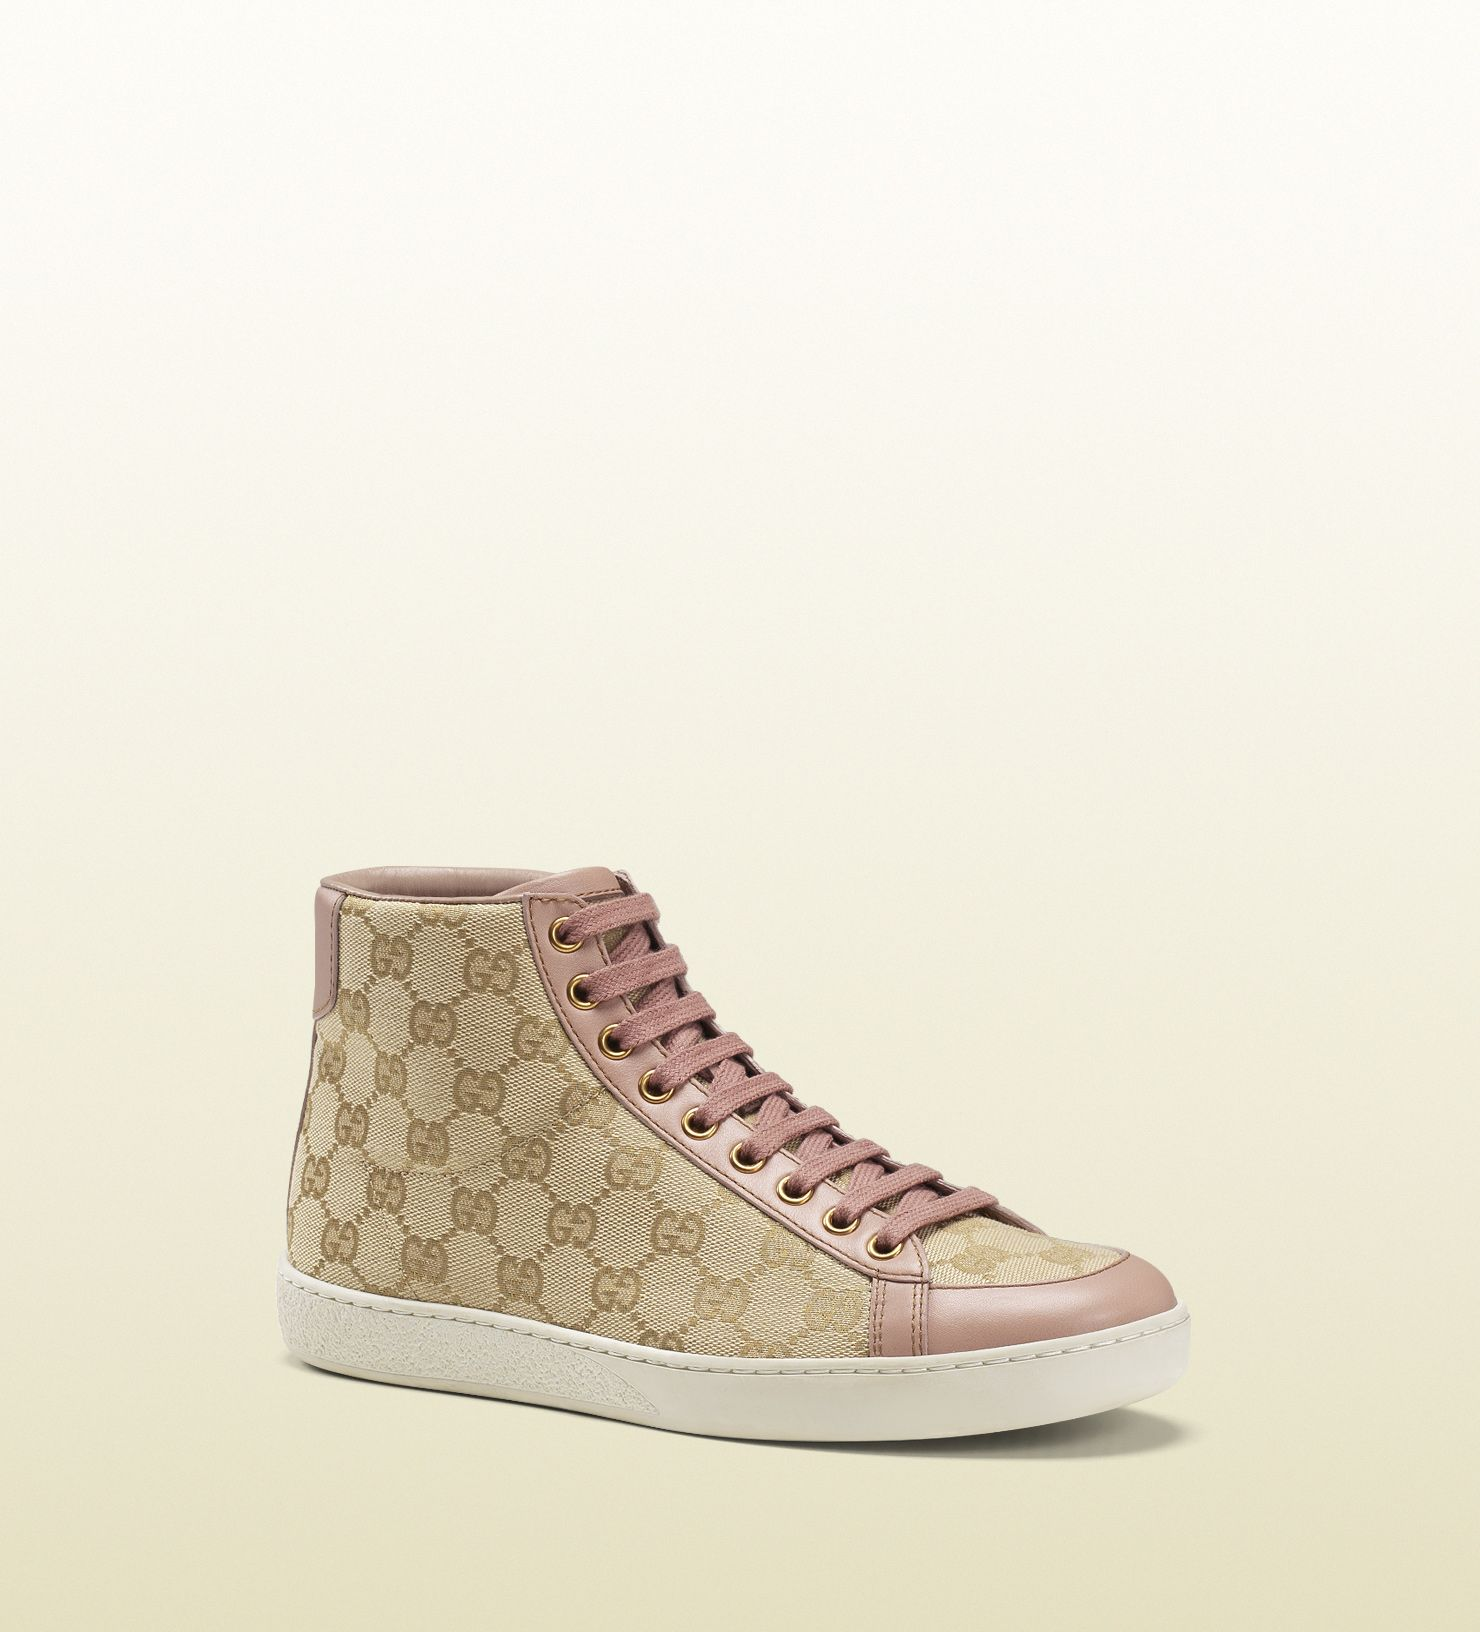 ac7aef0ce204 Gucci - brooklyn original GG canvas high-top sneaker